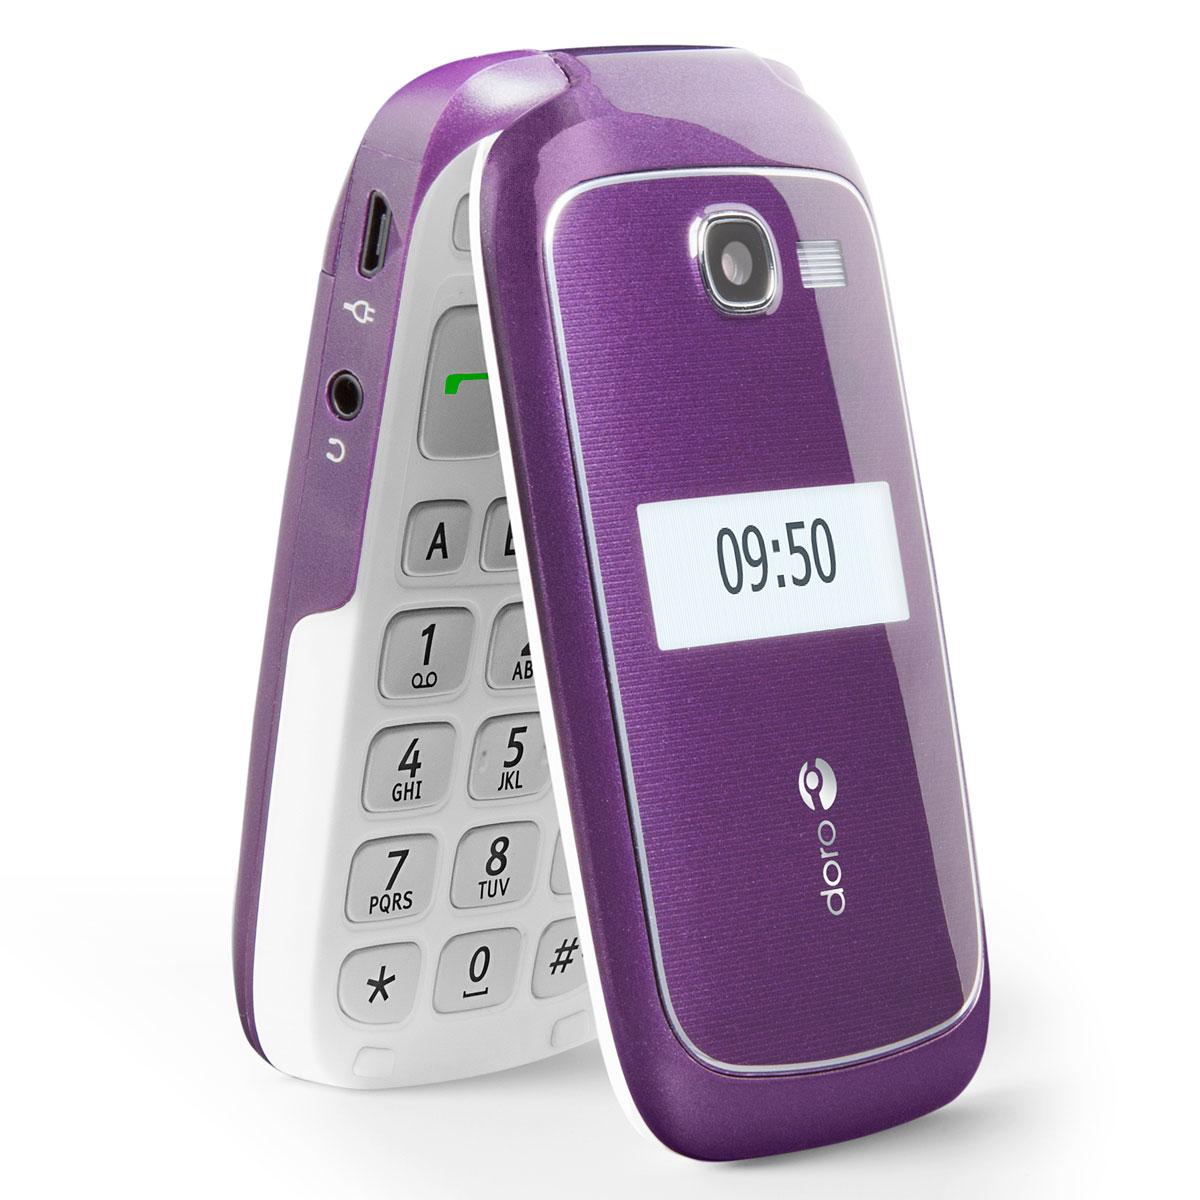 Doro phoneeasy 615 violet mobile smartphone doro sur ldlc - Telephone portable doro pas cher ...